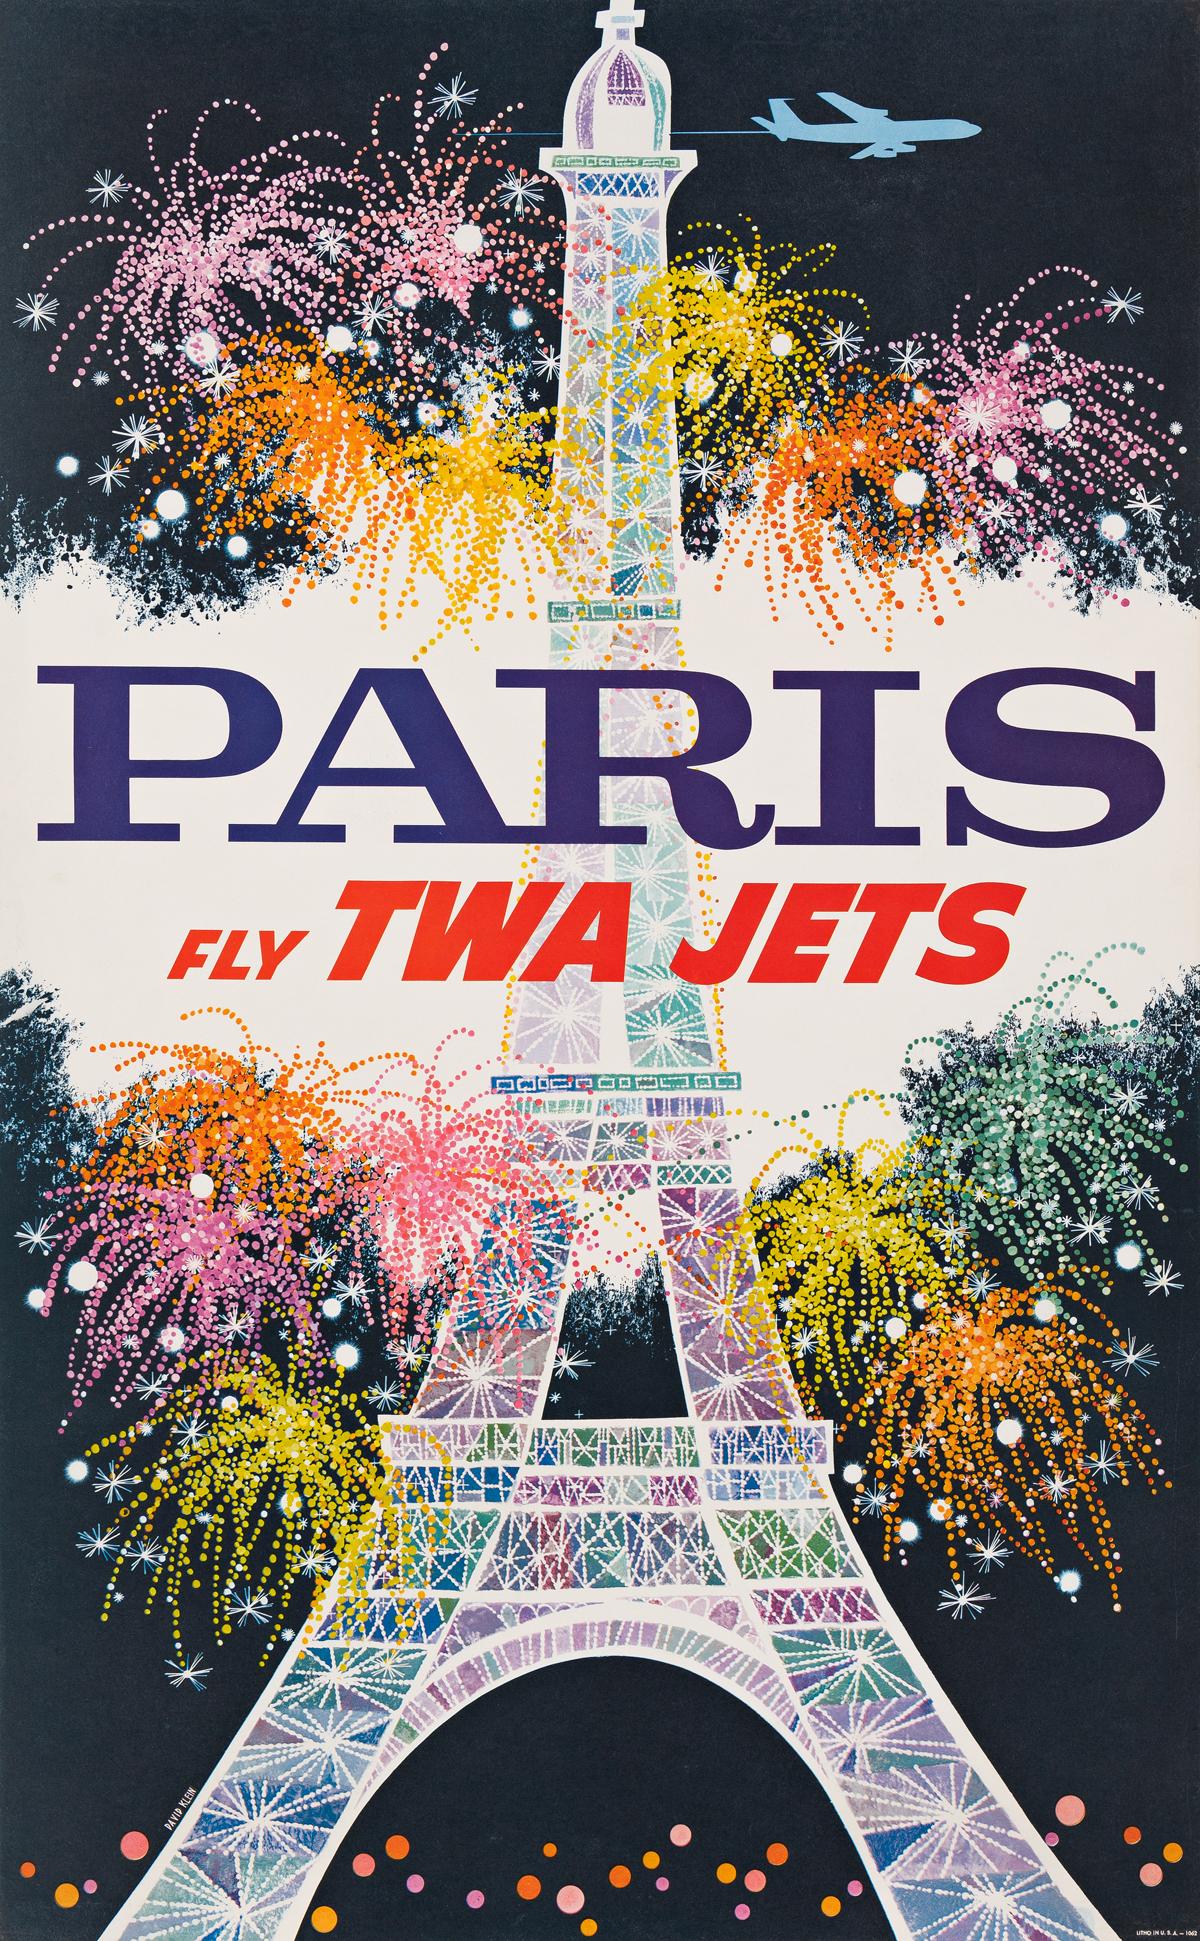 David Klein (1918-2005).  PARIS / FLY TWA JETS. 1962.